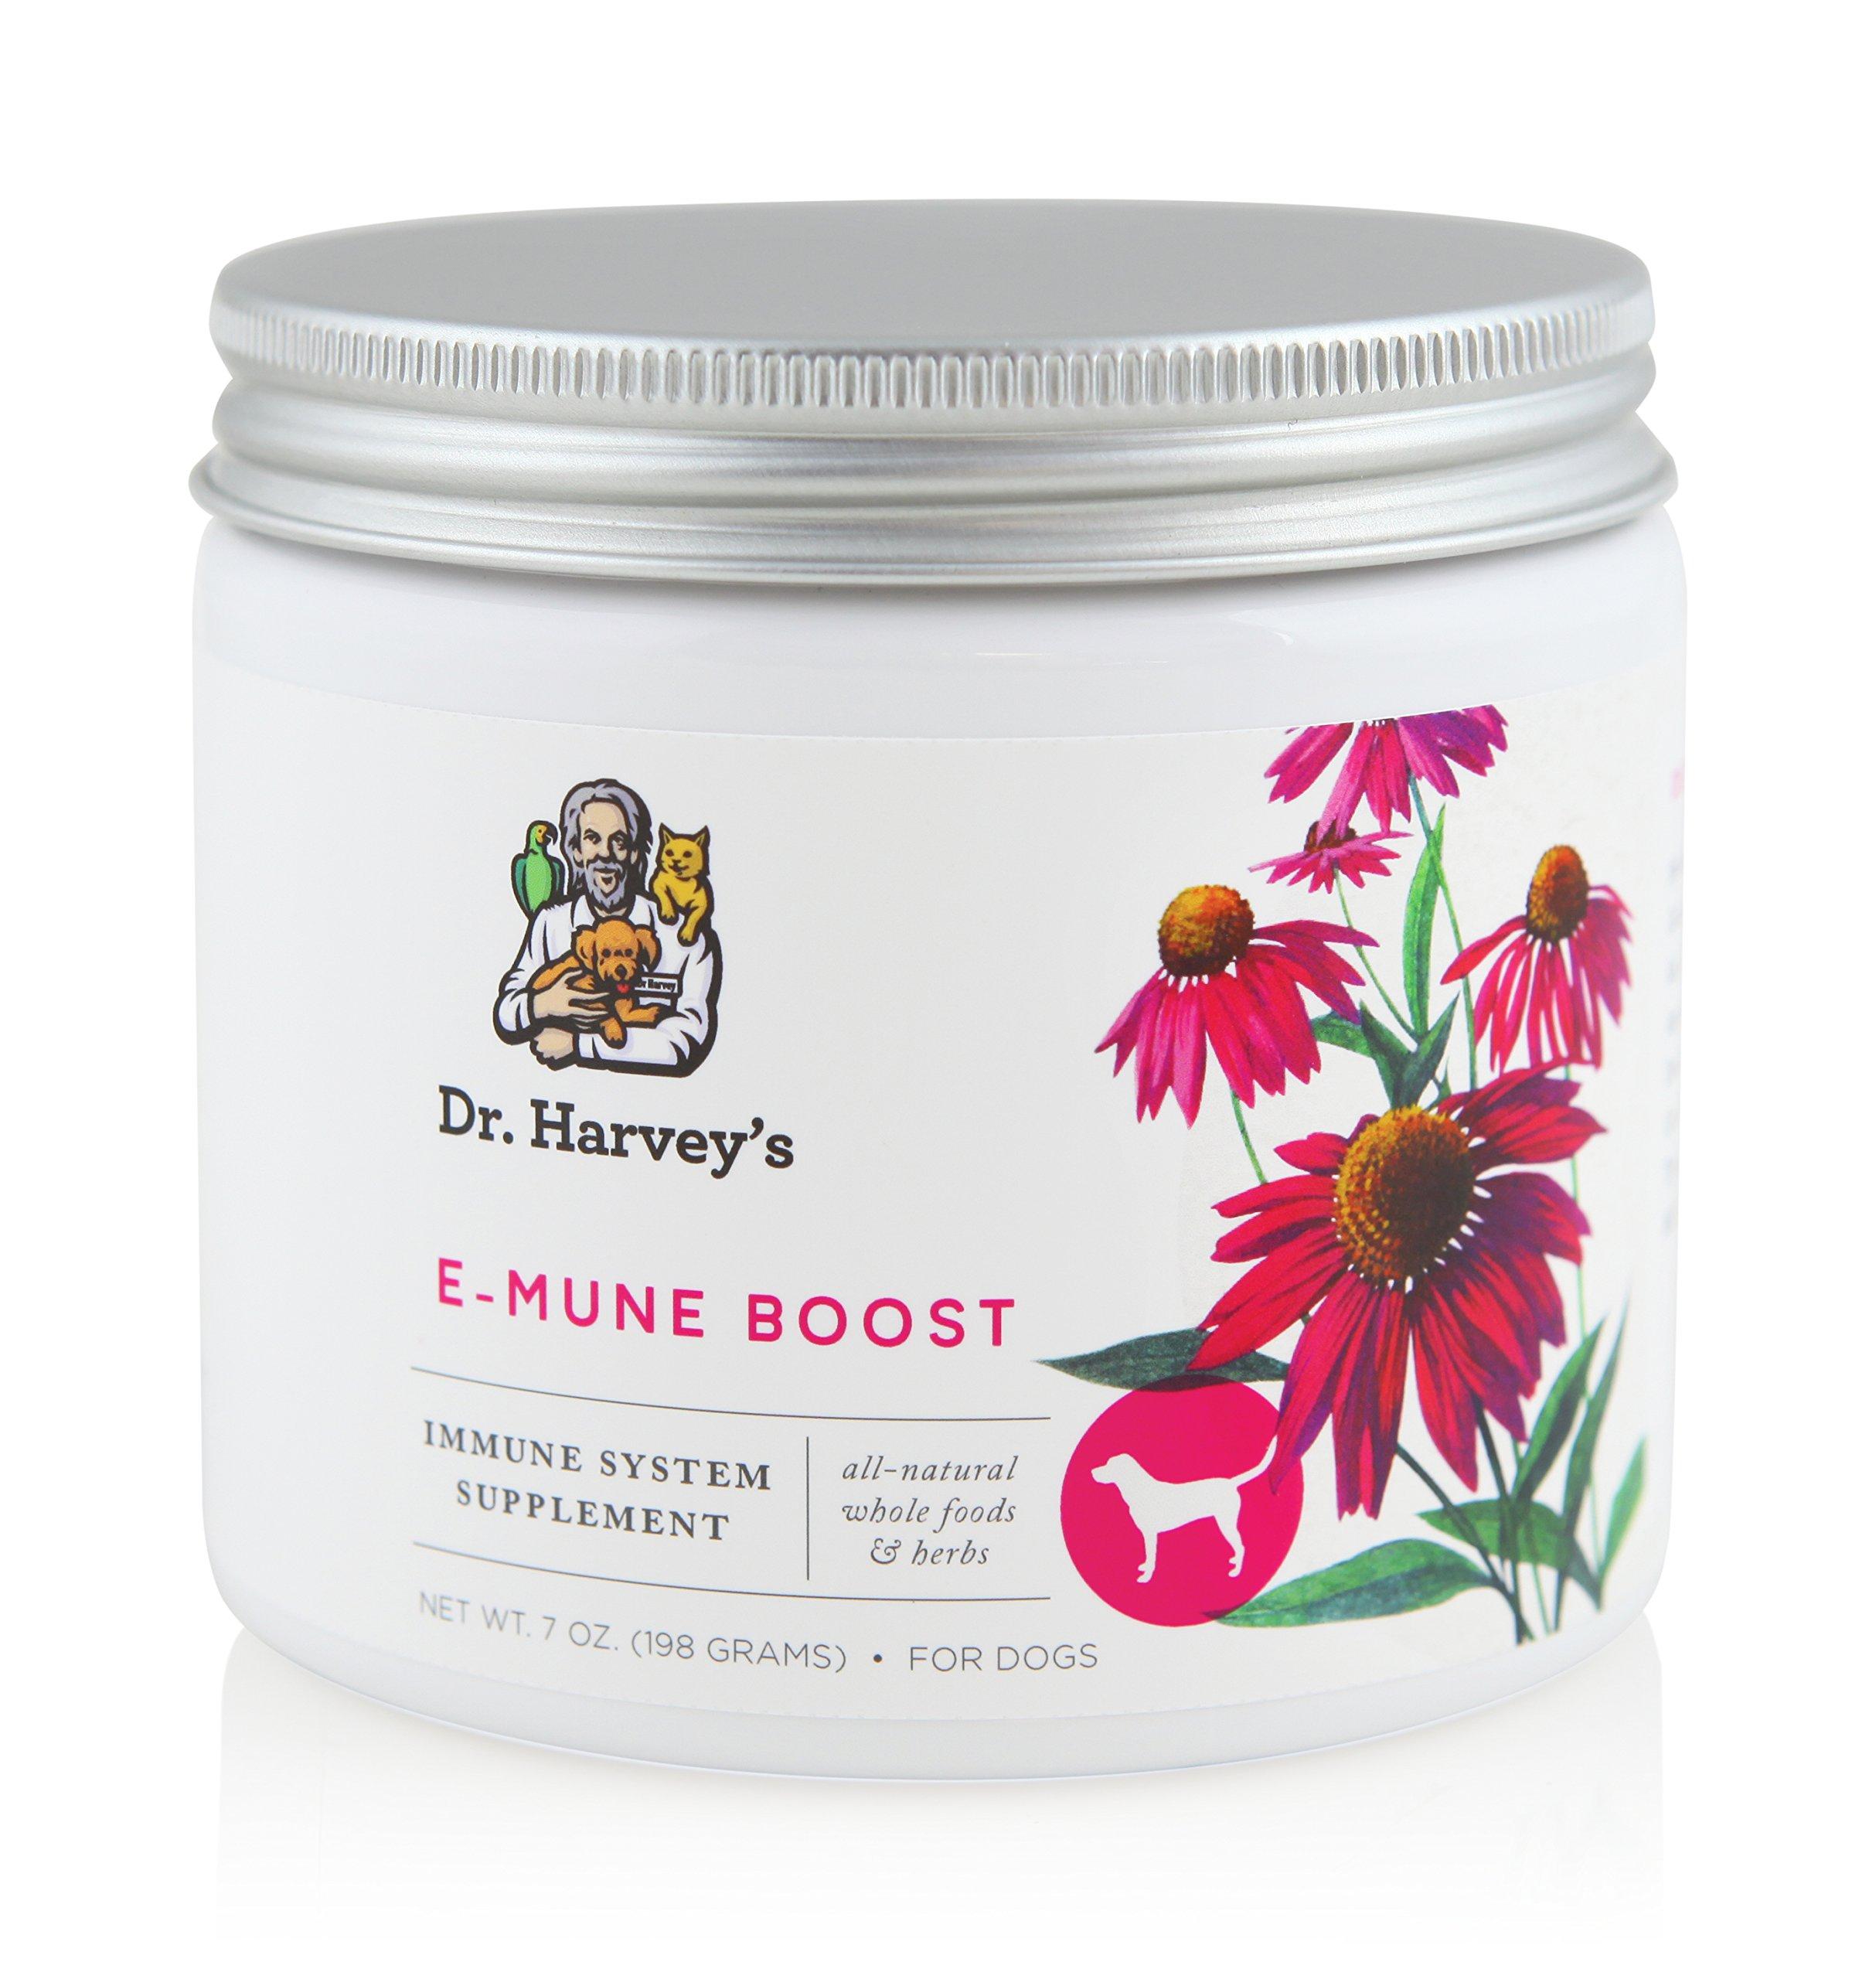 Dr. Harvey's Emune-Boost - Immune System Supplement for Dogs (7 Ounces)